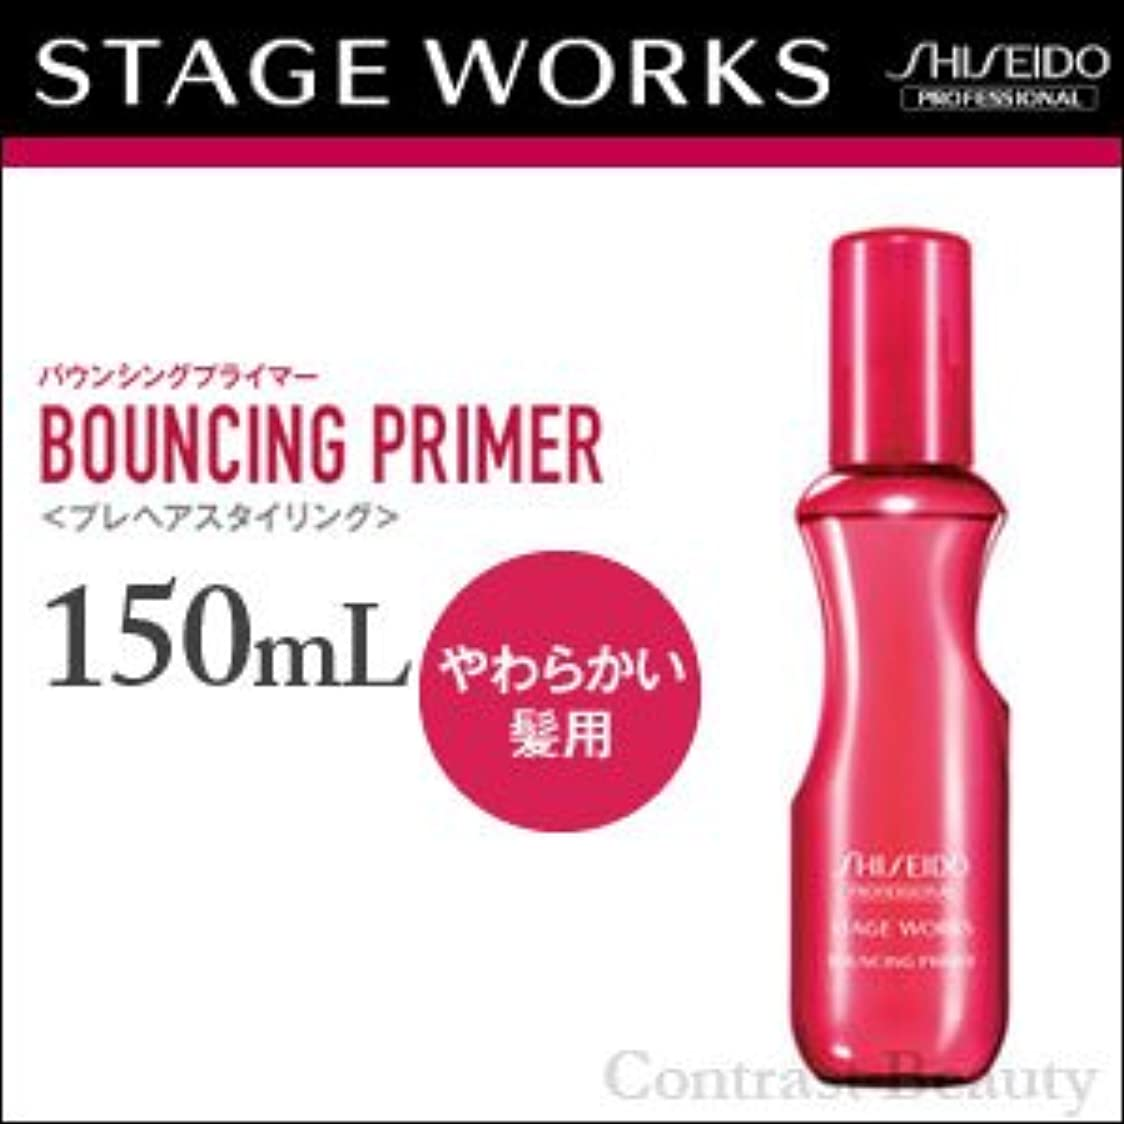 【x3個セット】 資生堂 ステージワークス バウンシングプライマー 150ml